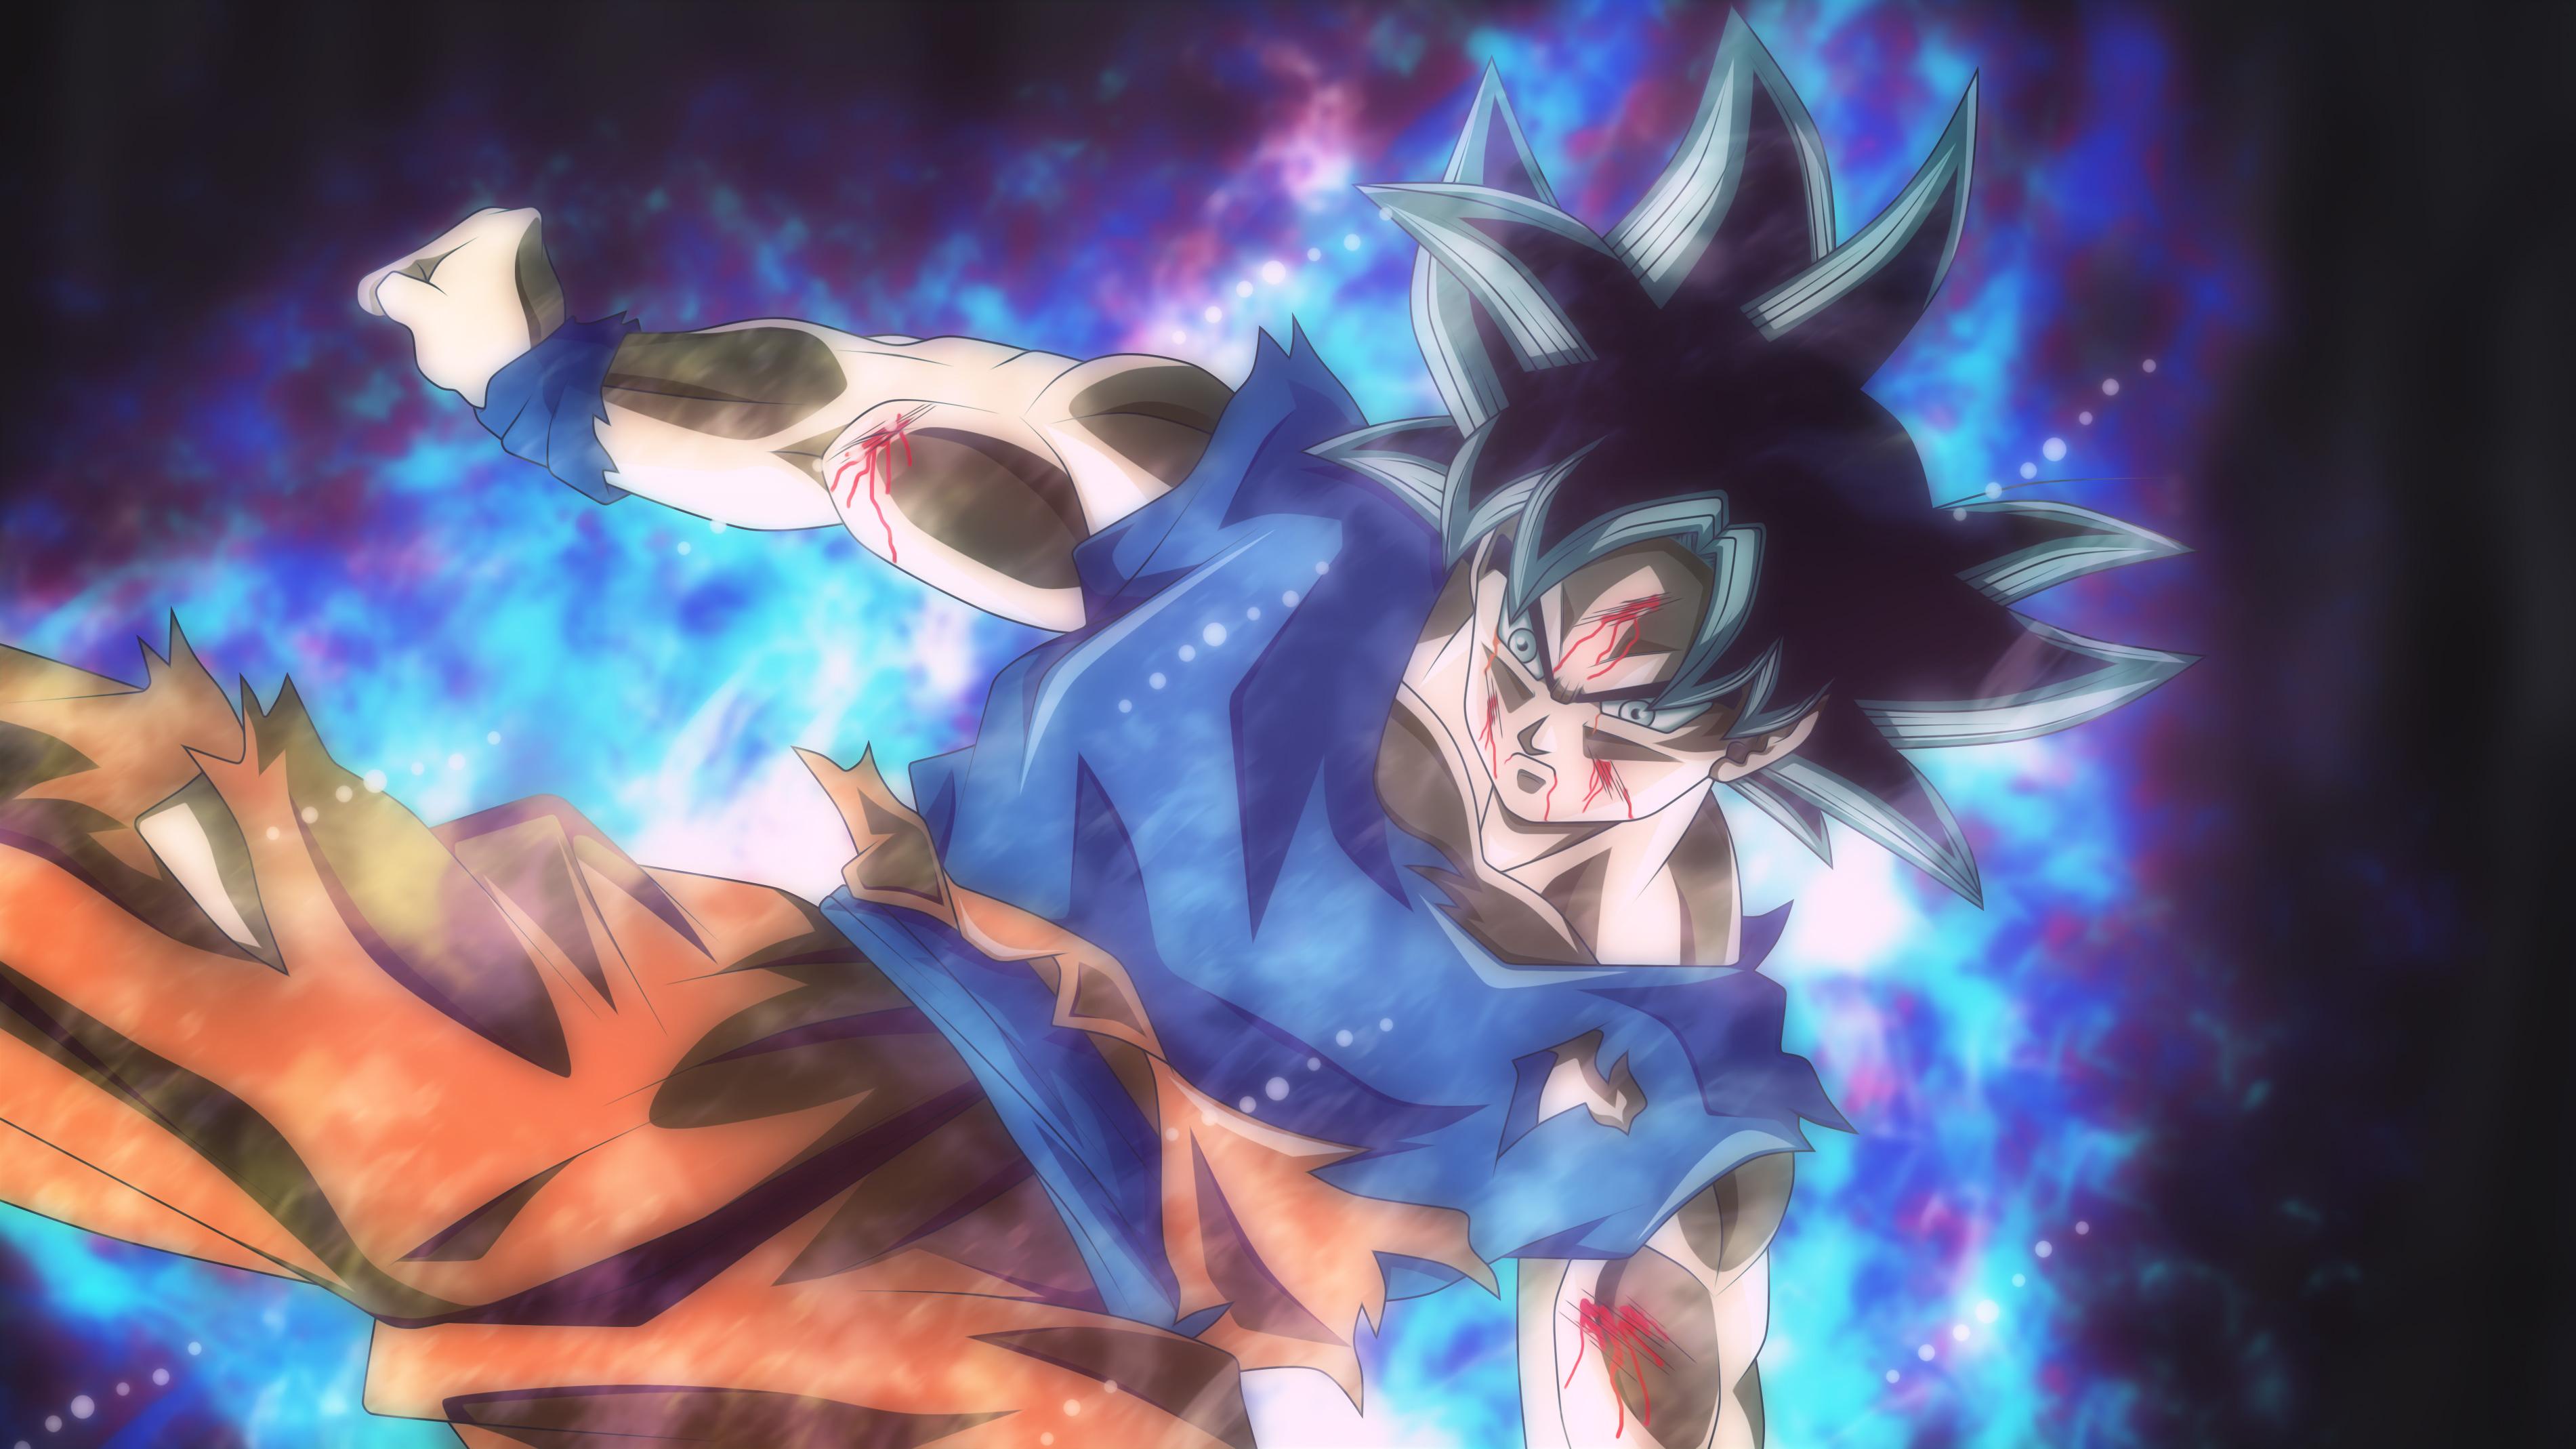 1280x900 Anime Dragon Ball Super 1280x900 Resolution Hd 4k